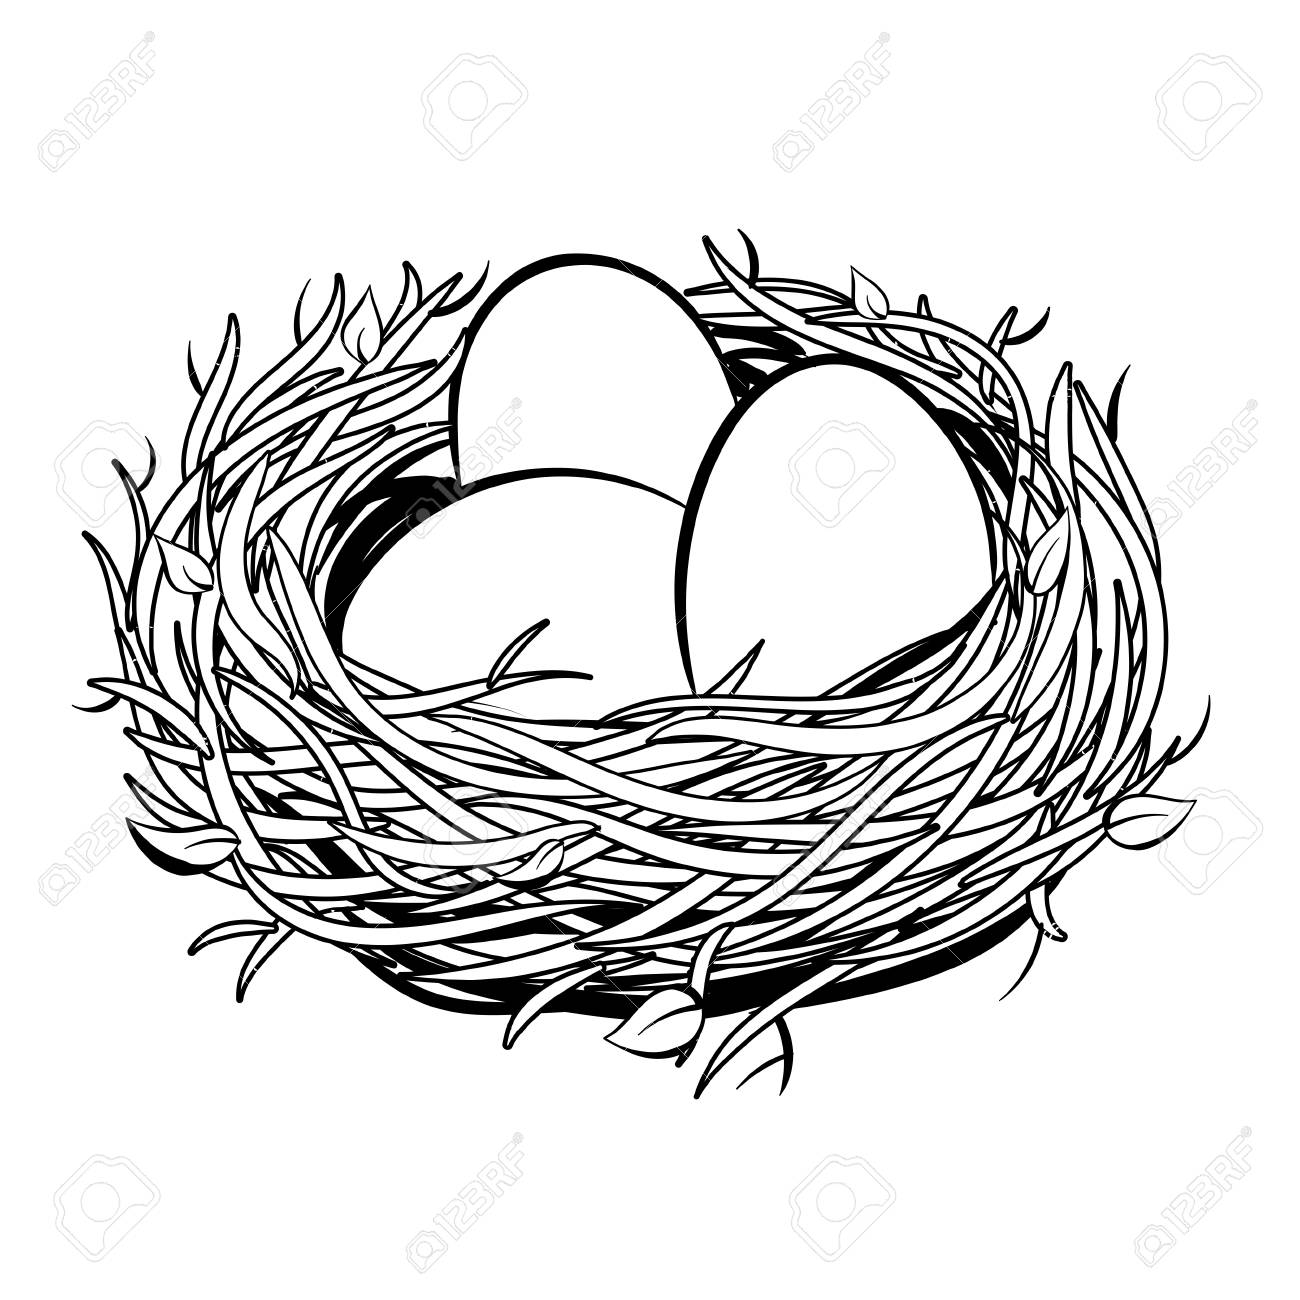 Nest with golden egg coloring illustration.